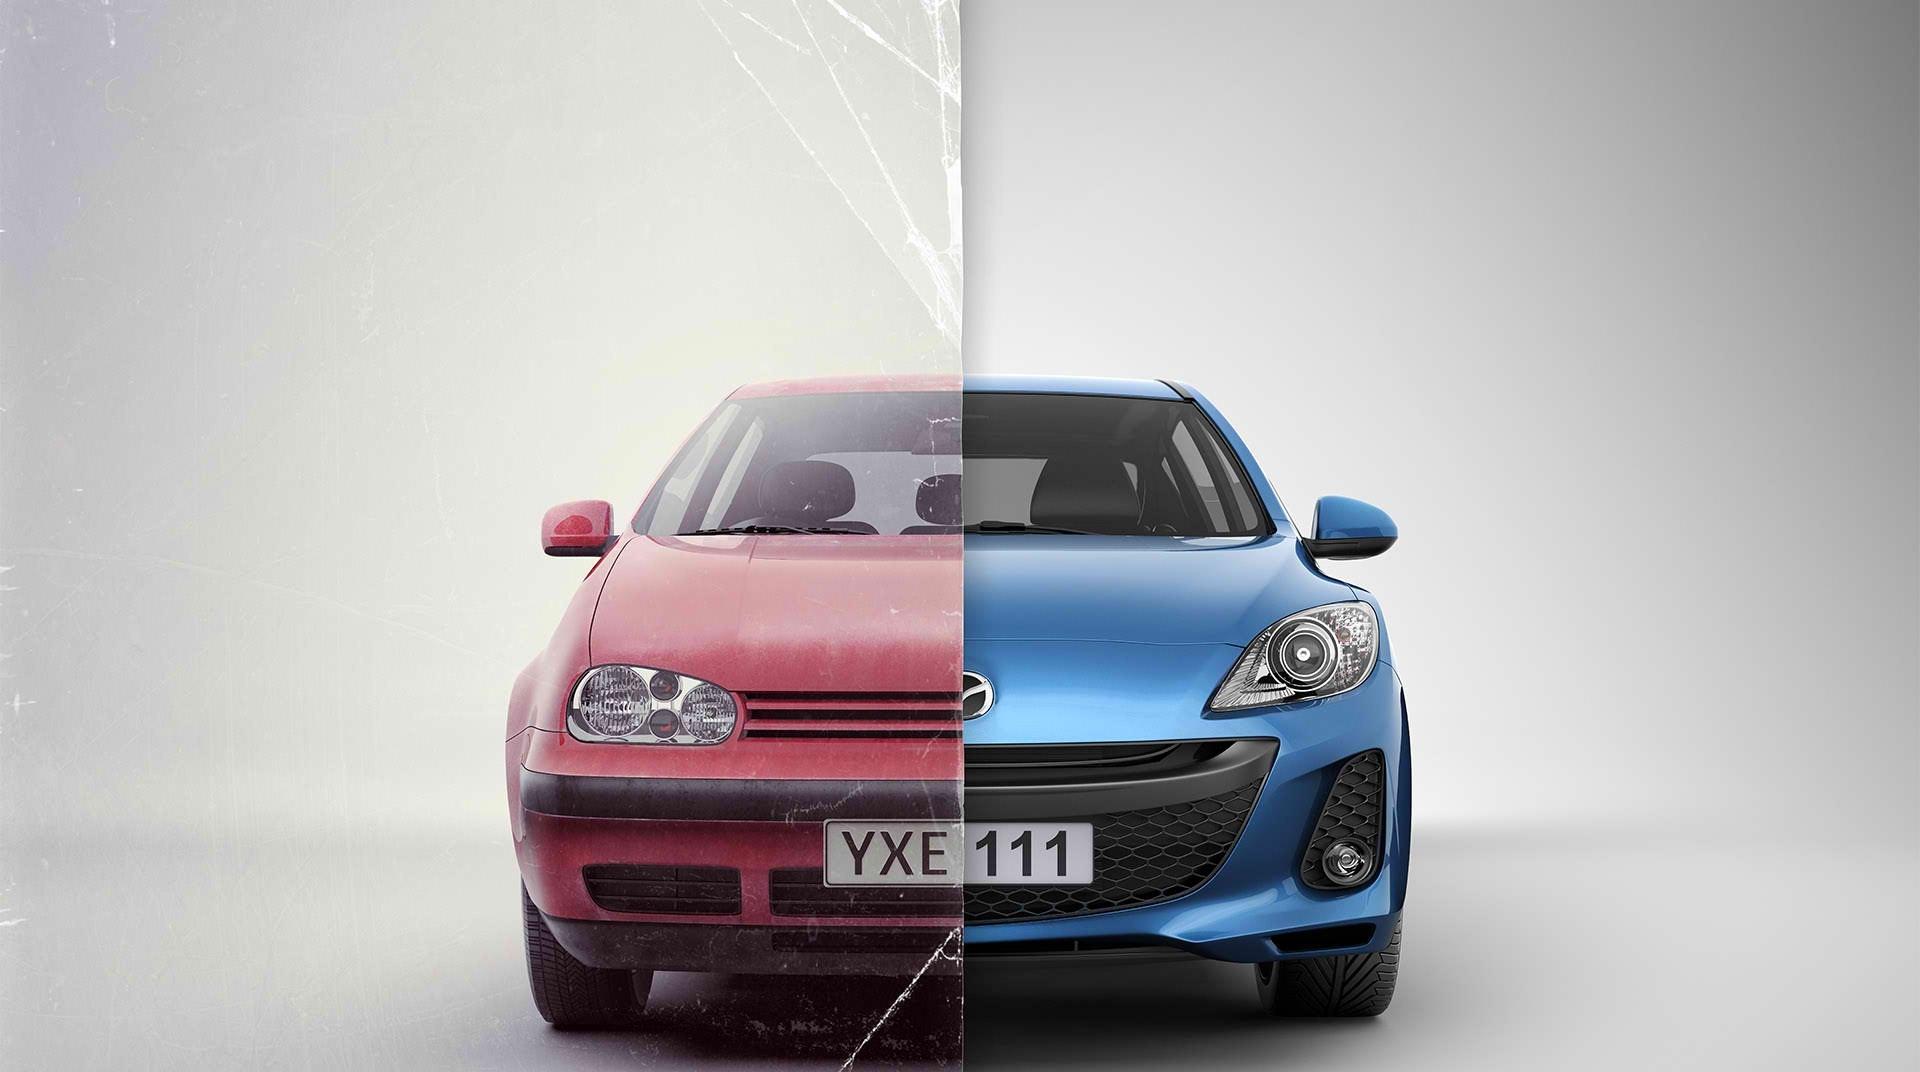 kelebihan dan kekurangan mobil bekas dan baru